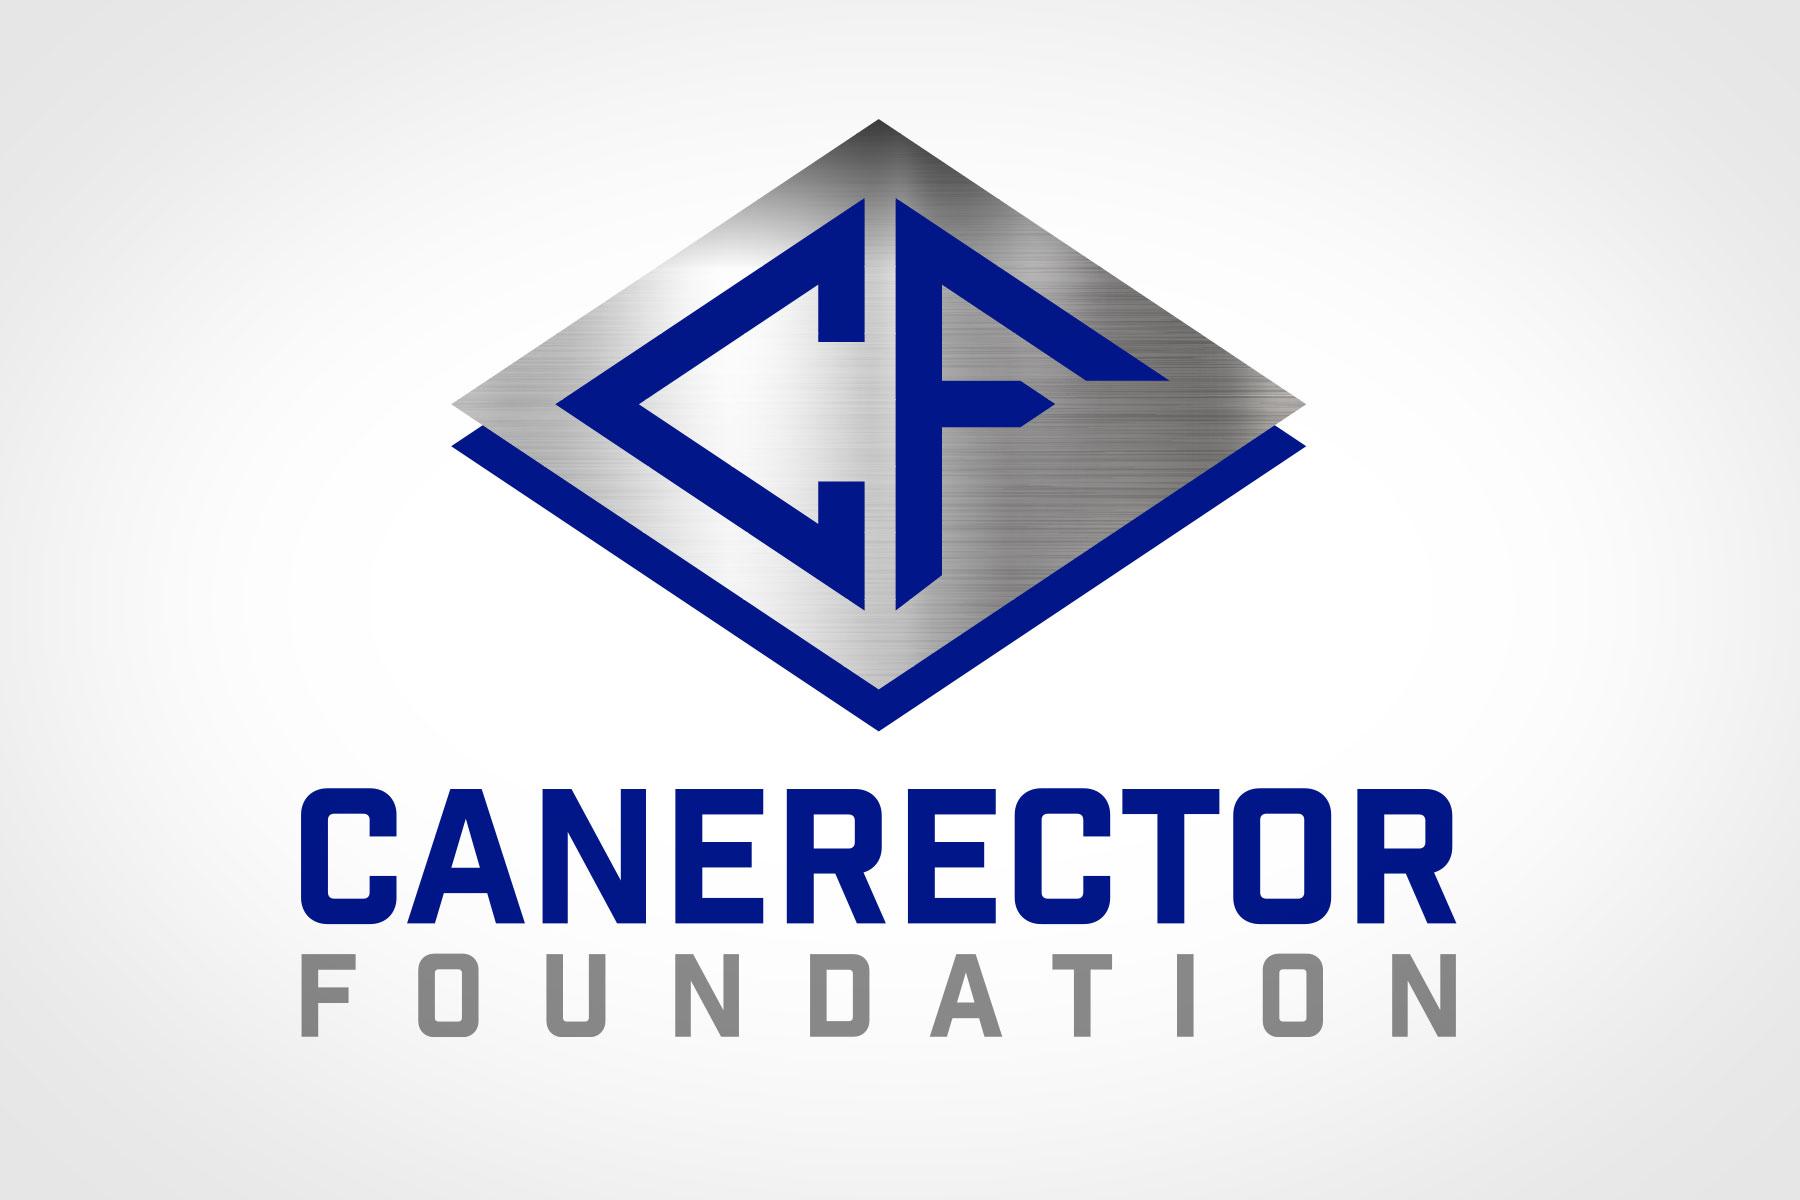 Newly Established Canerector Foundation Quickly passes $1 million Donation Milestone